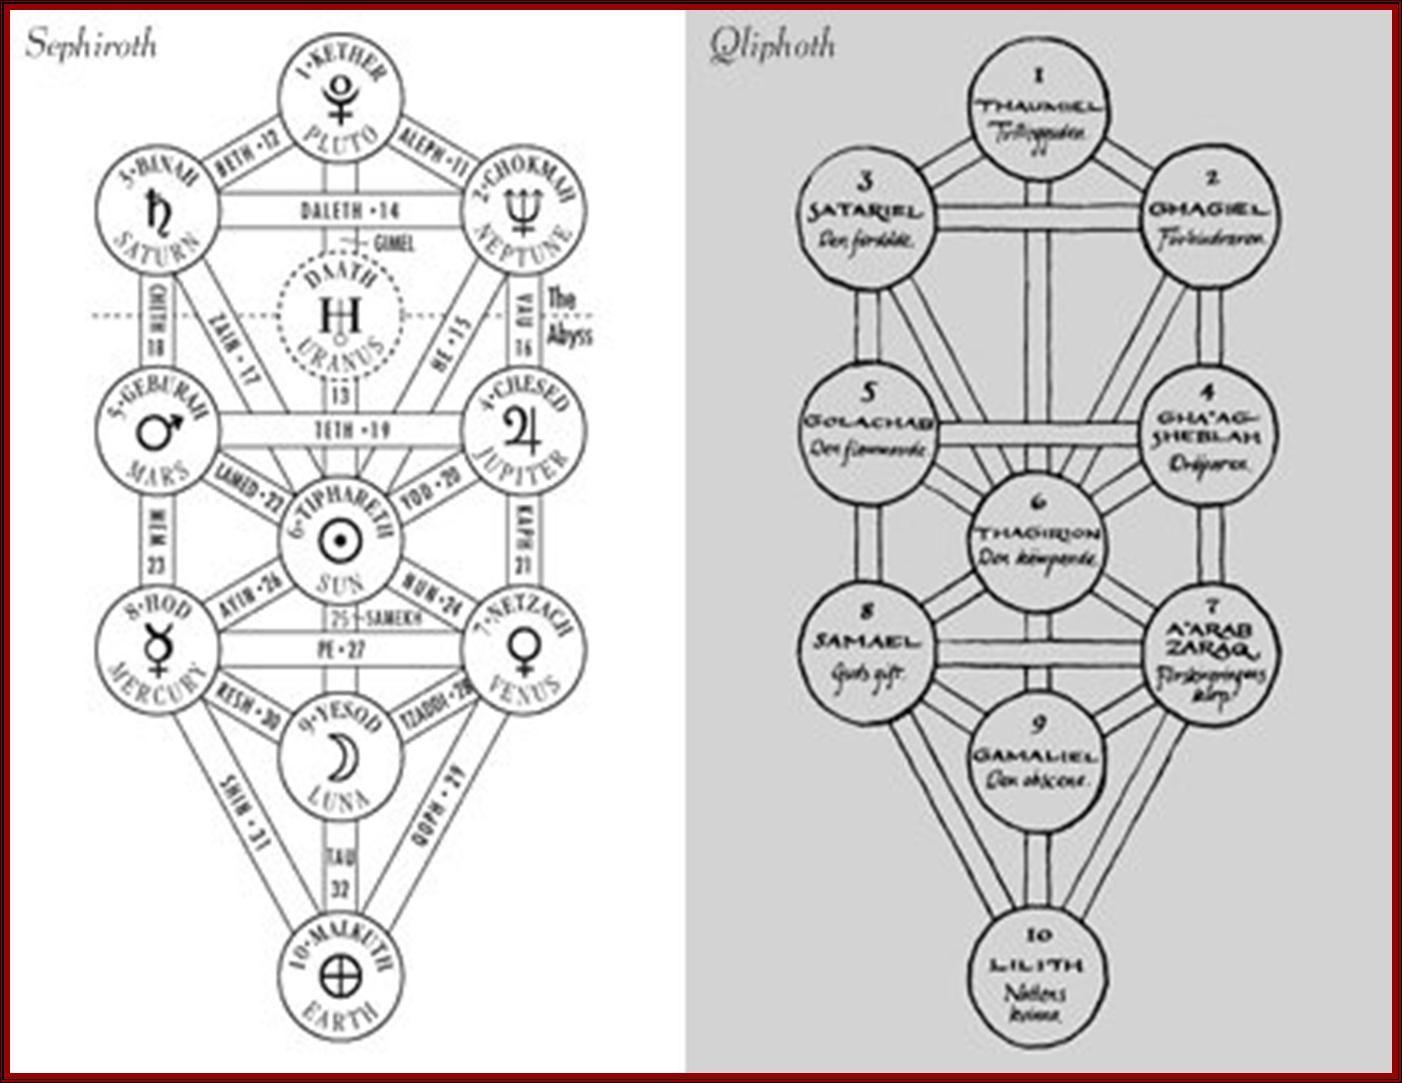 Chaigidel Demone Ile Ilgili Grsel Sonucu Dark Occultdark Circuitry By Brujo On Deviantart Bigdave409